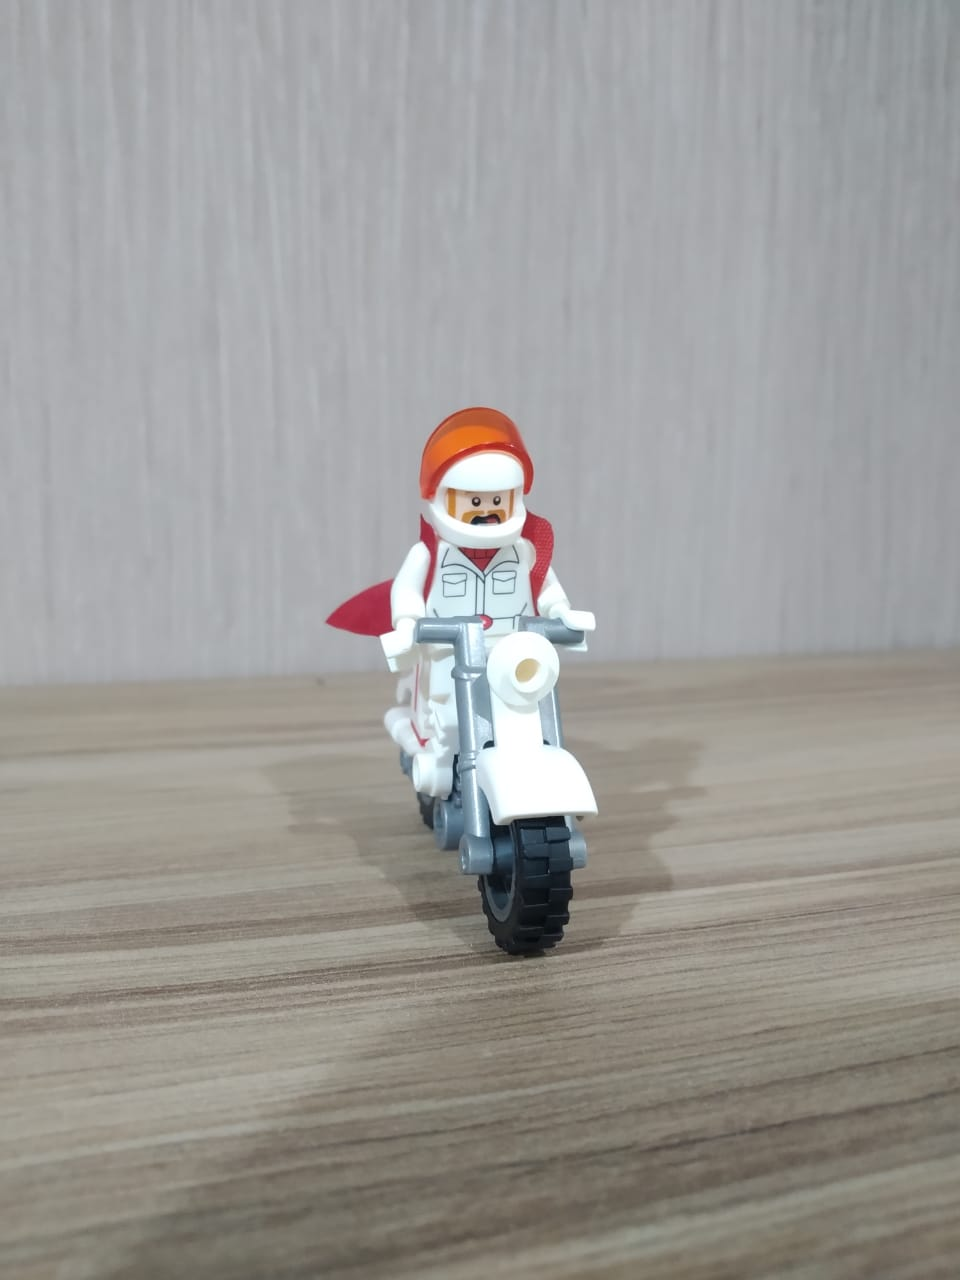 LEGO: Duke Caboom - Toy Story